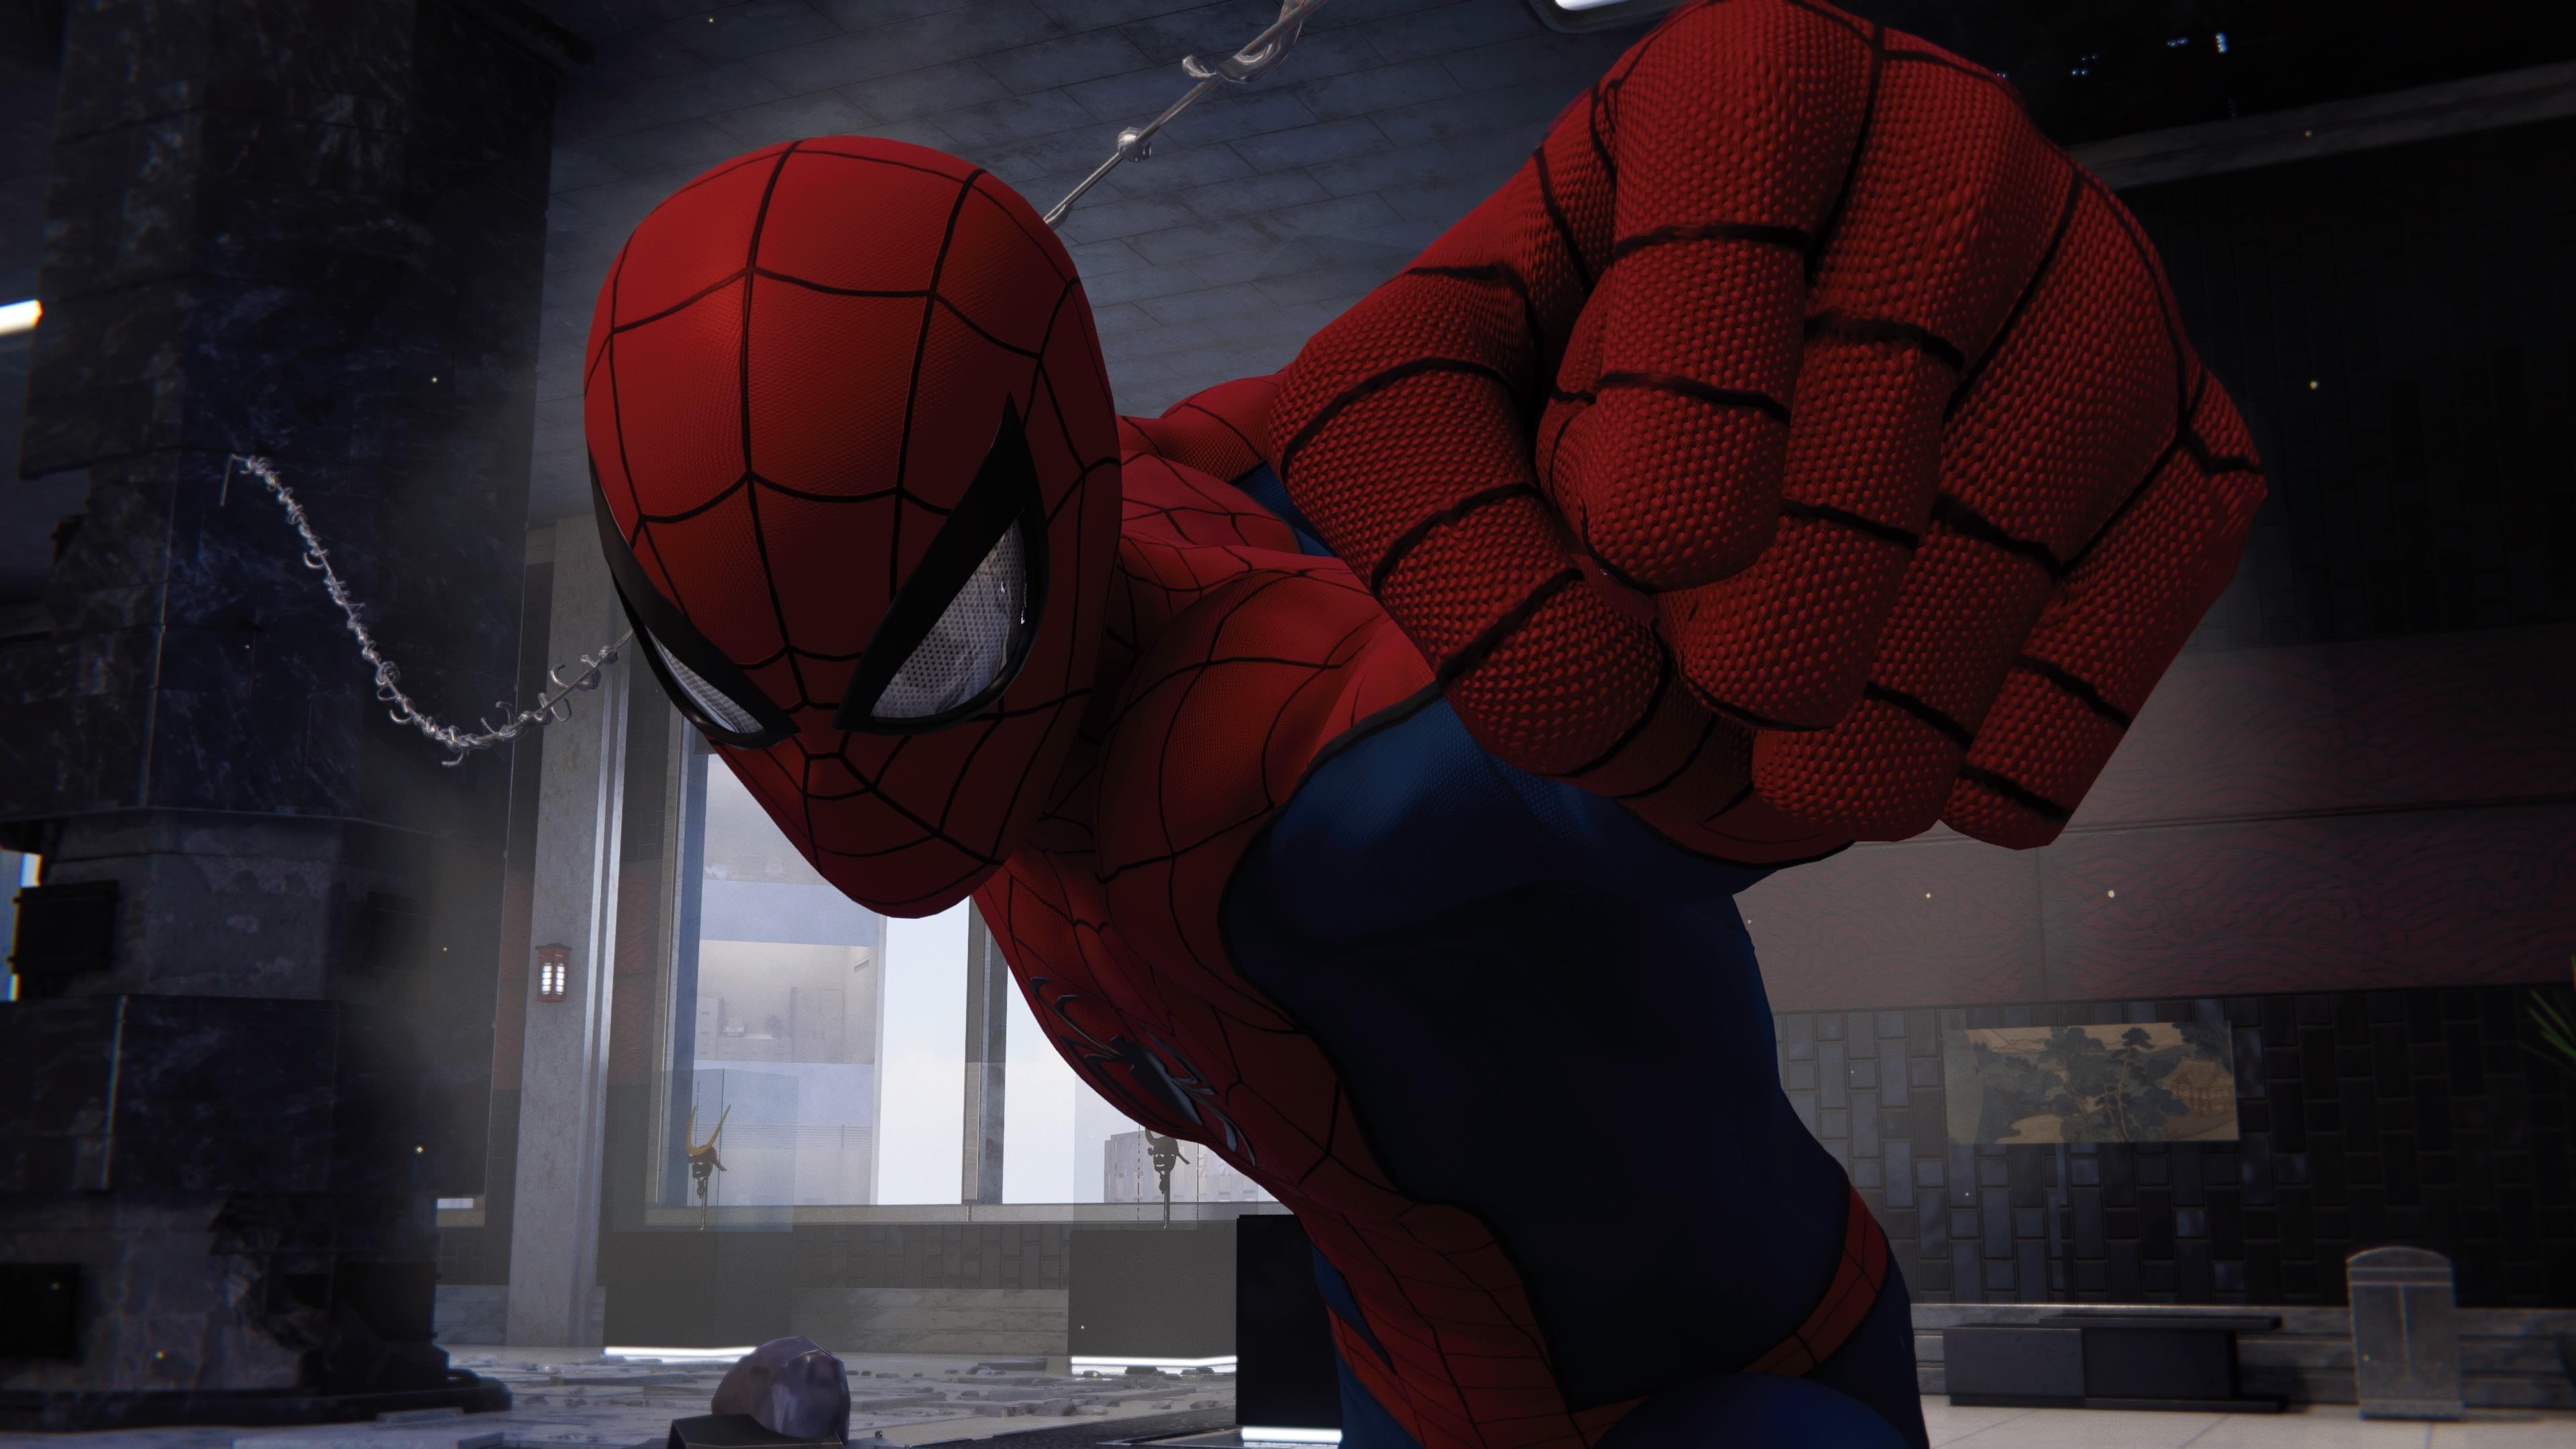 spiderman 4k ps4 pro 1542494955 - Spiderman 4k ps4 4k - spiderman wallpapers ps4 new, spiderman 4k new wallpapers